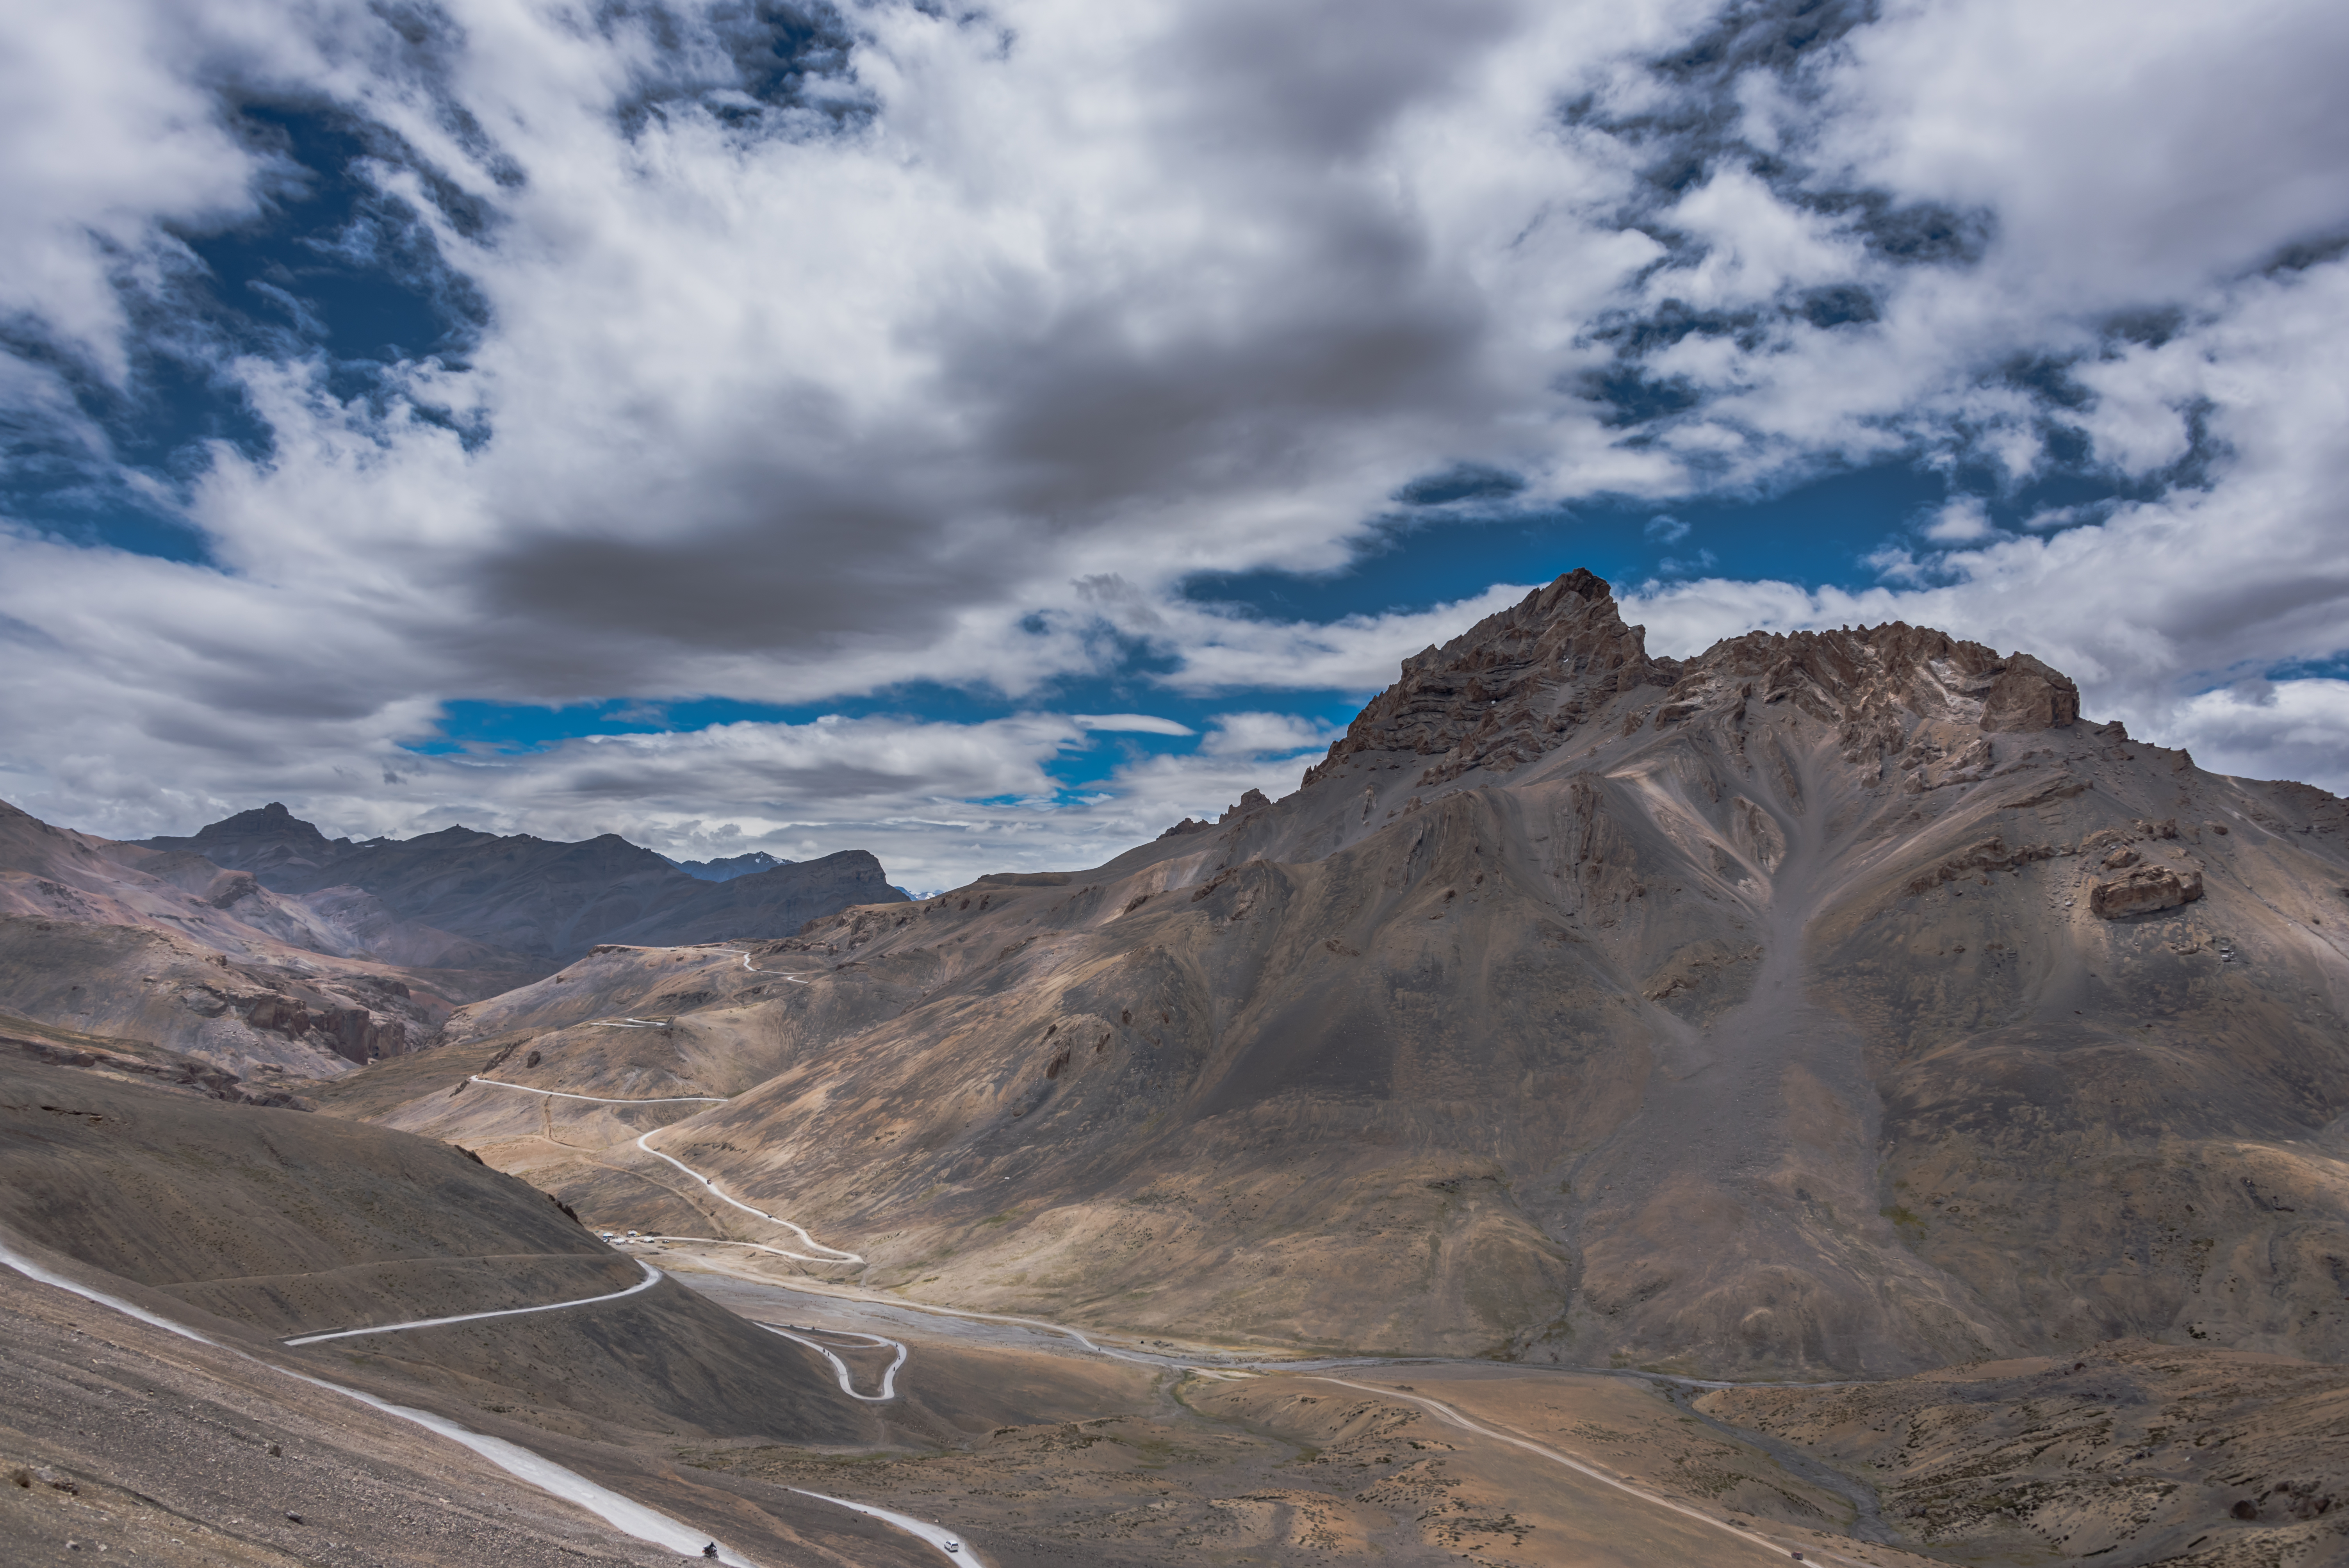 Waves of Himalayas